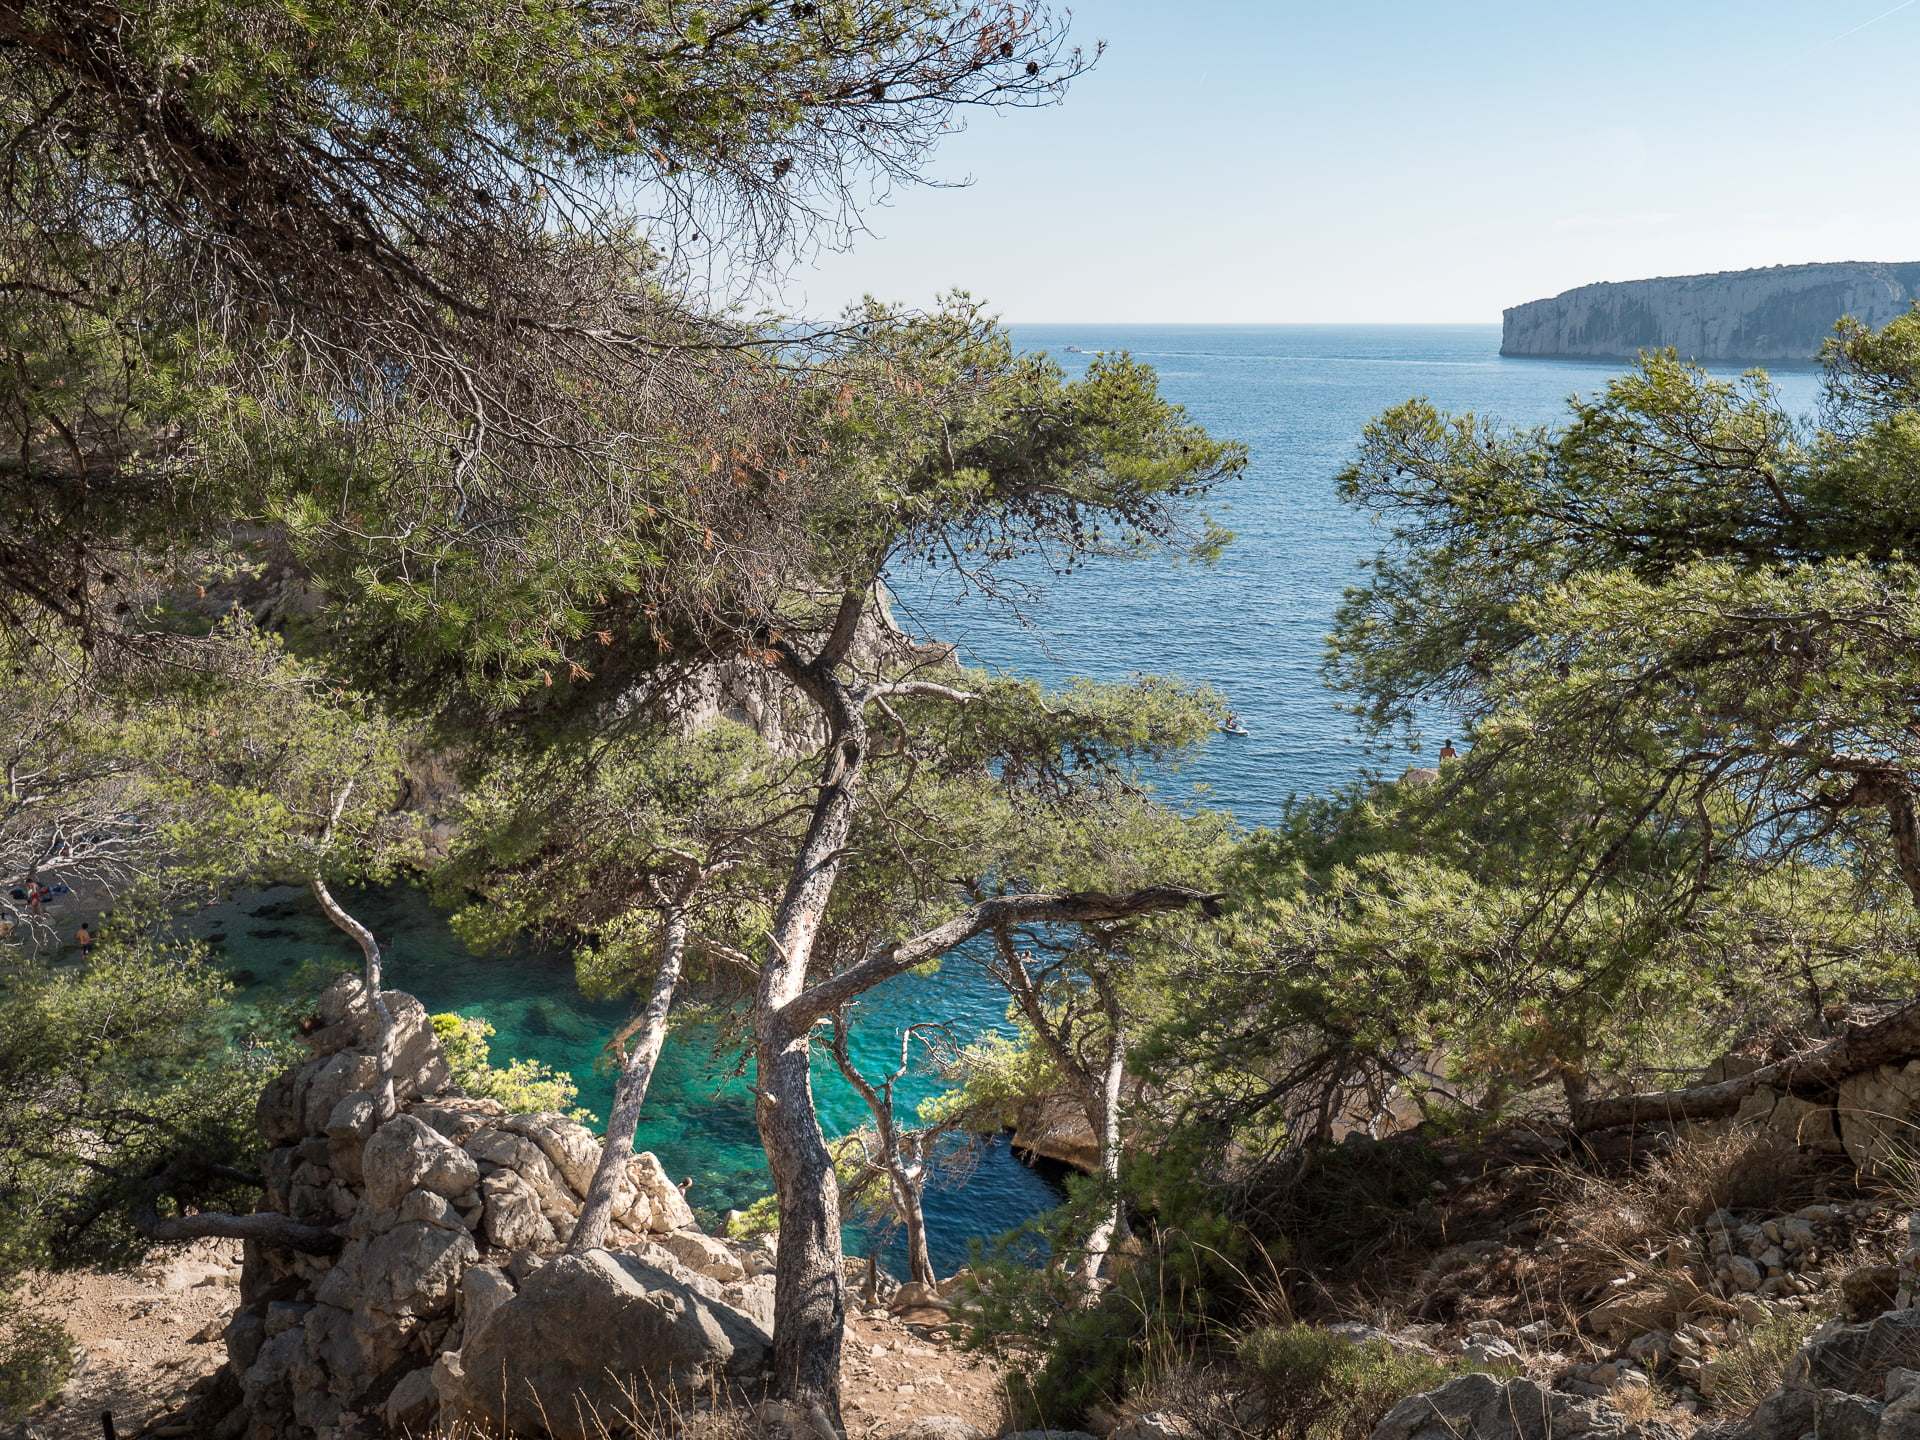 calanques 13 - Les globe blogueurs - blog voyage nature